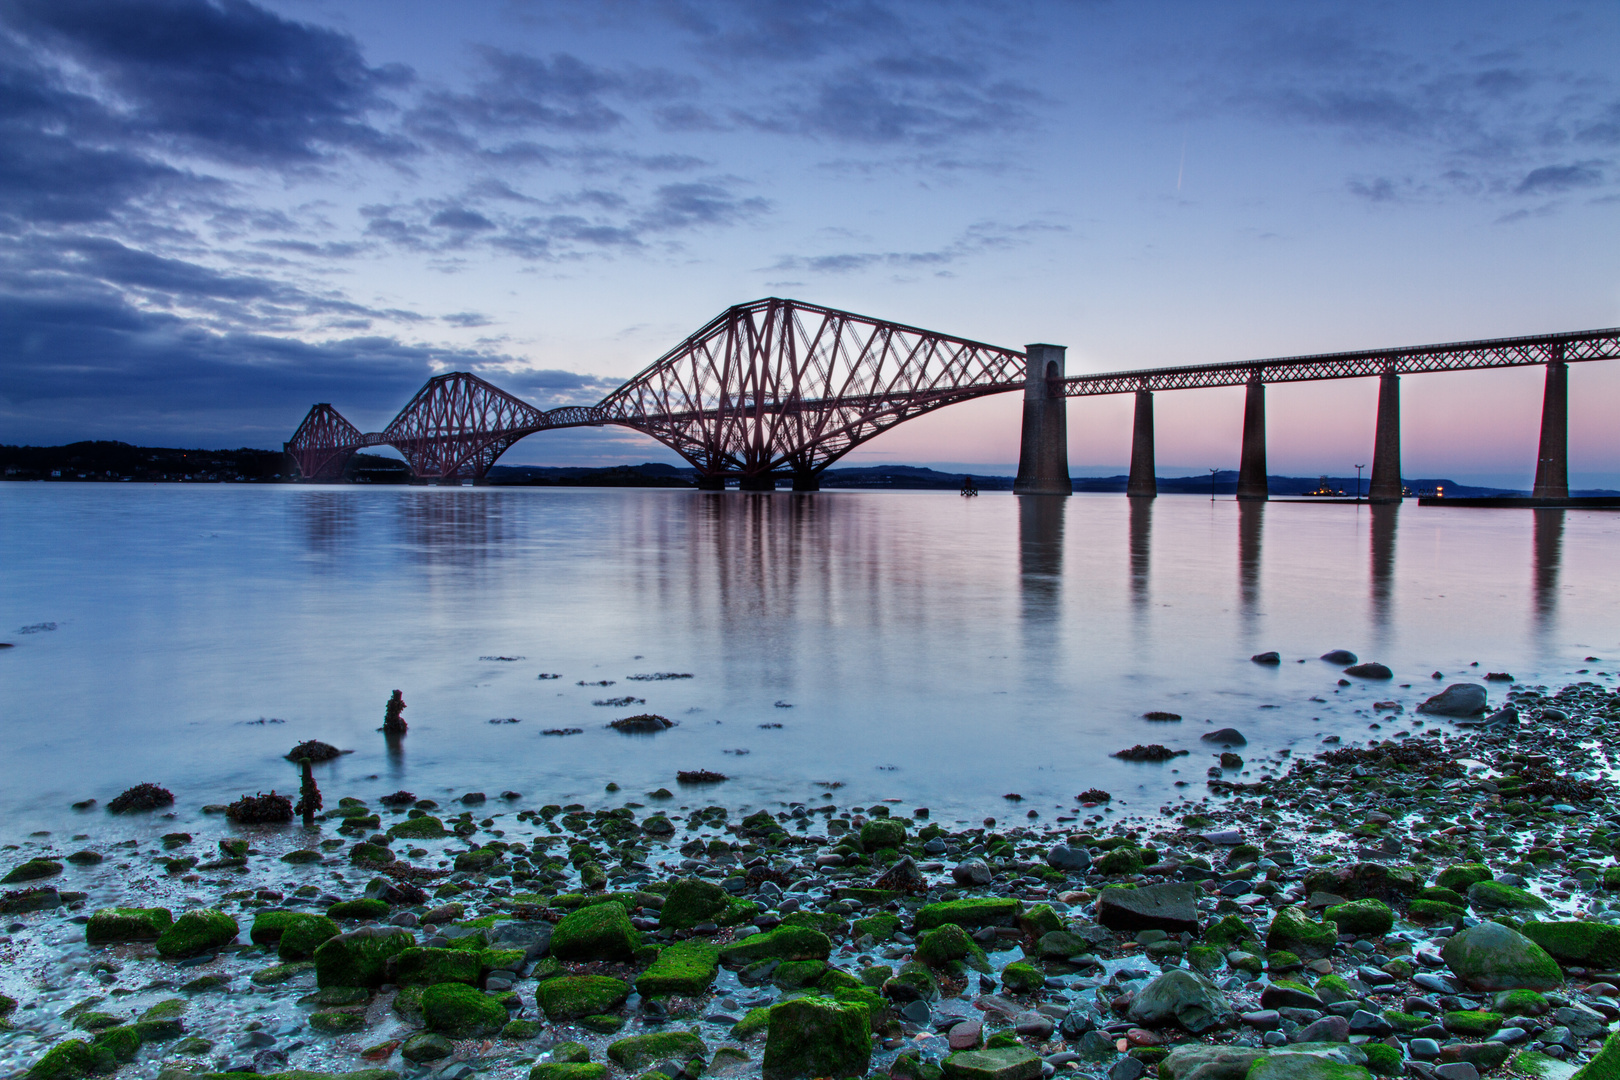 Scotland 2013 - I